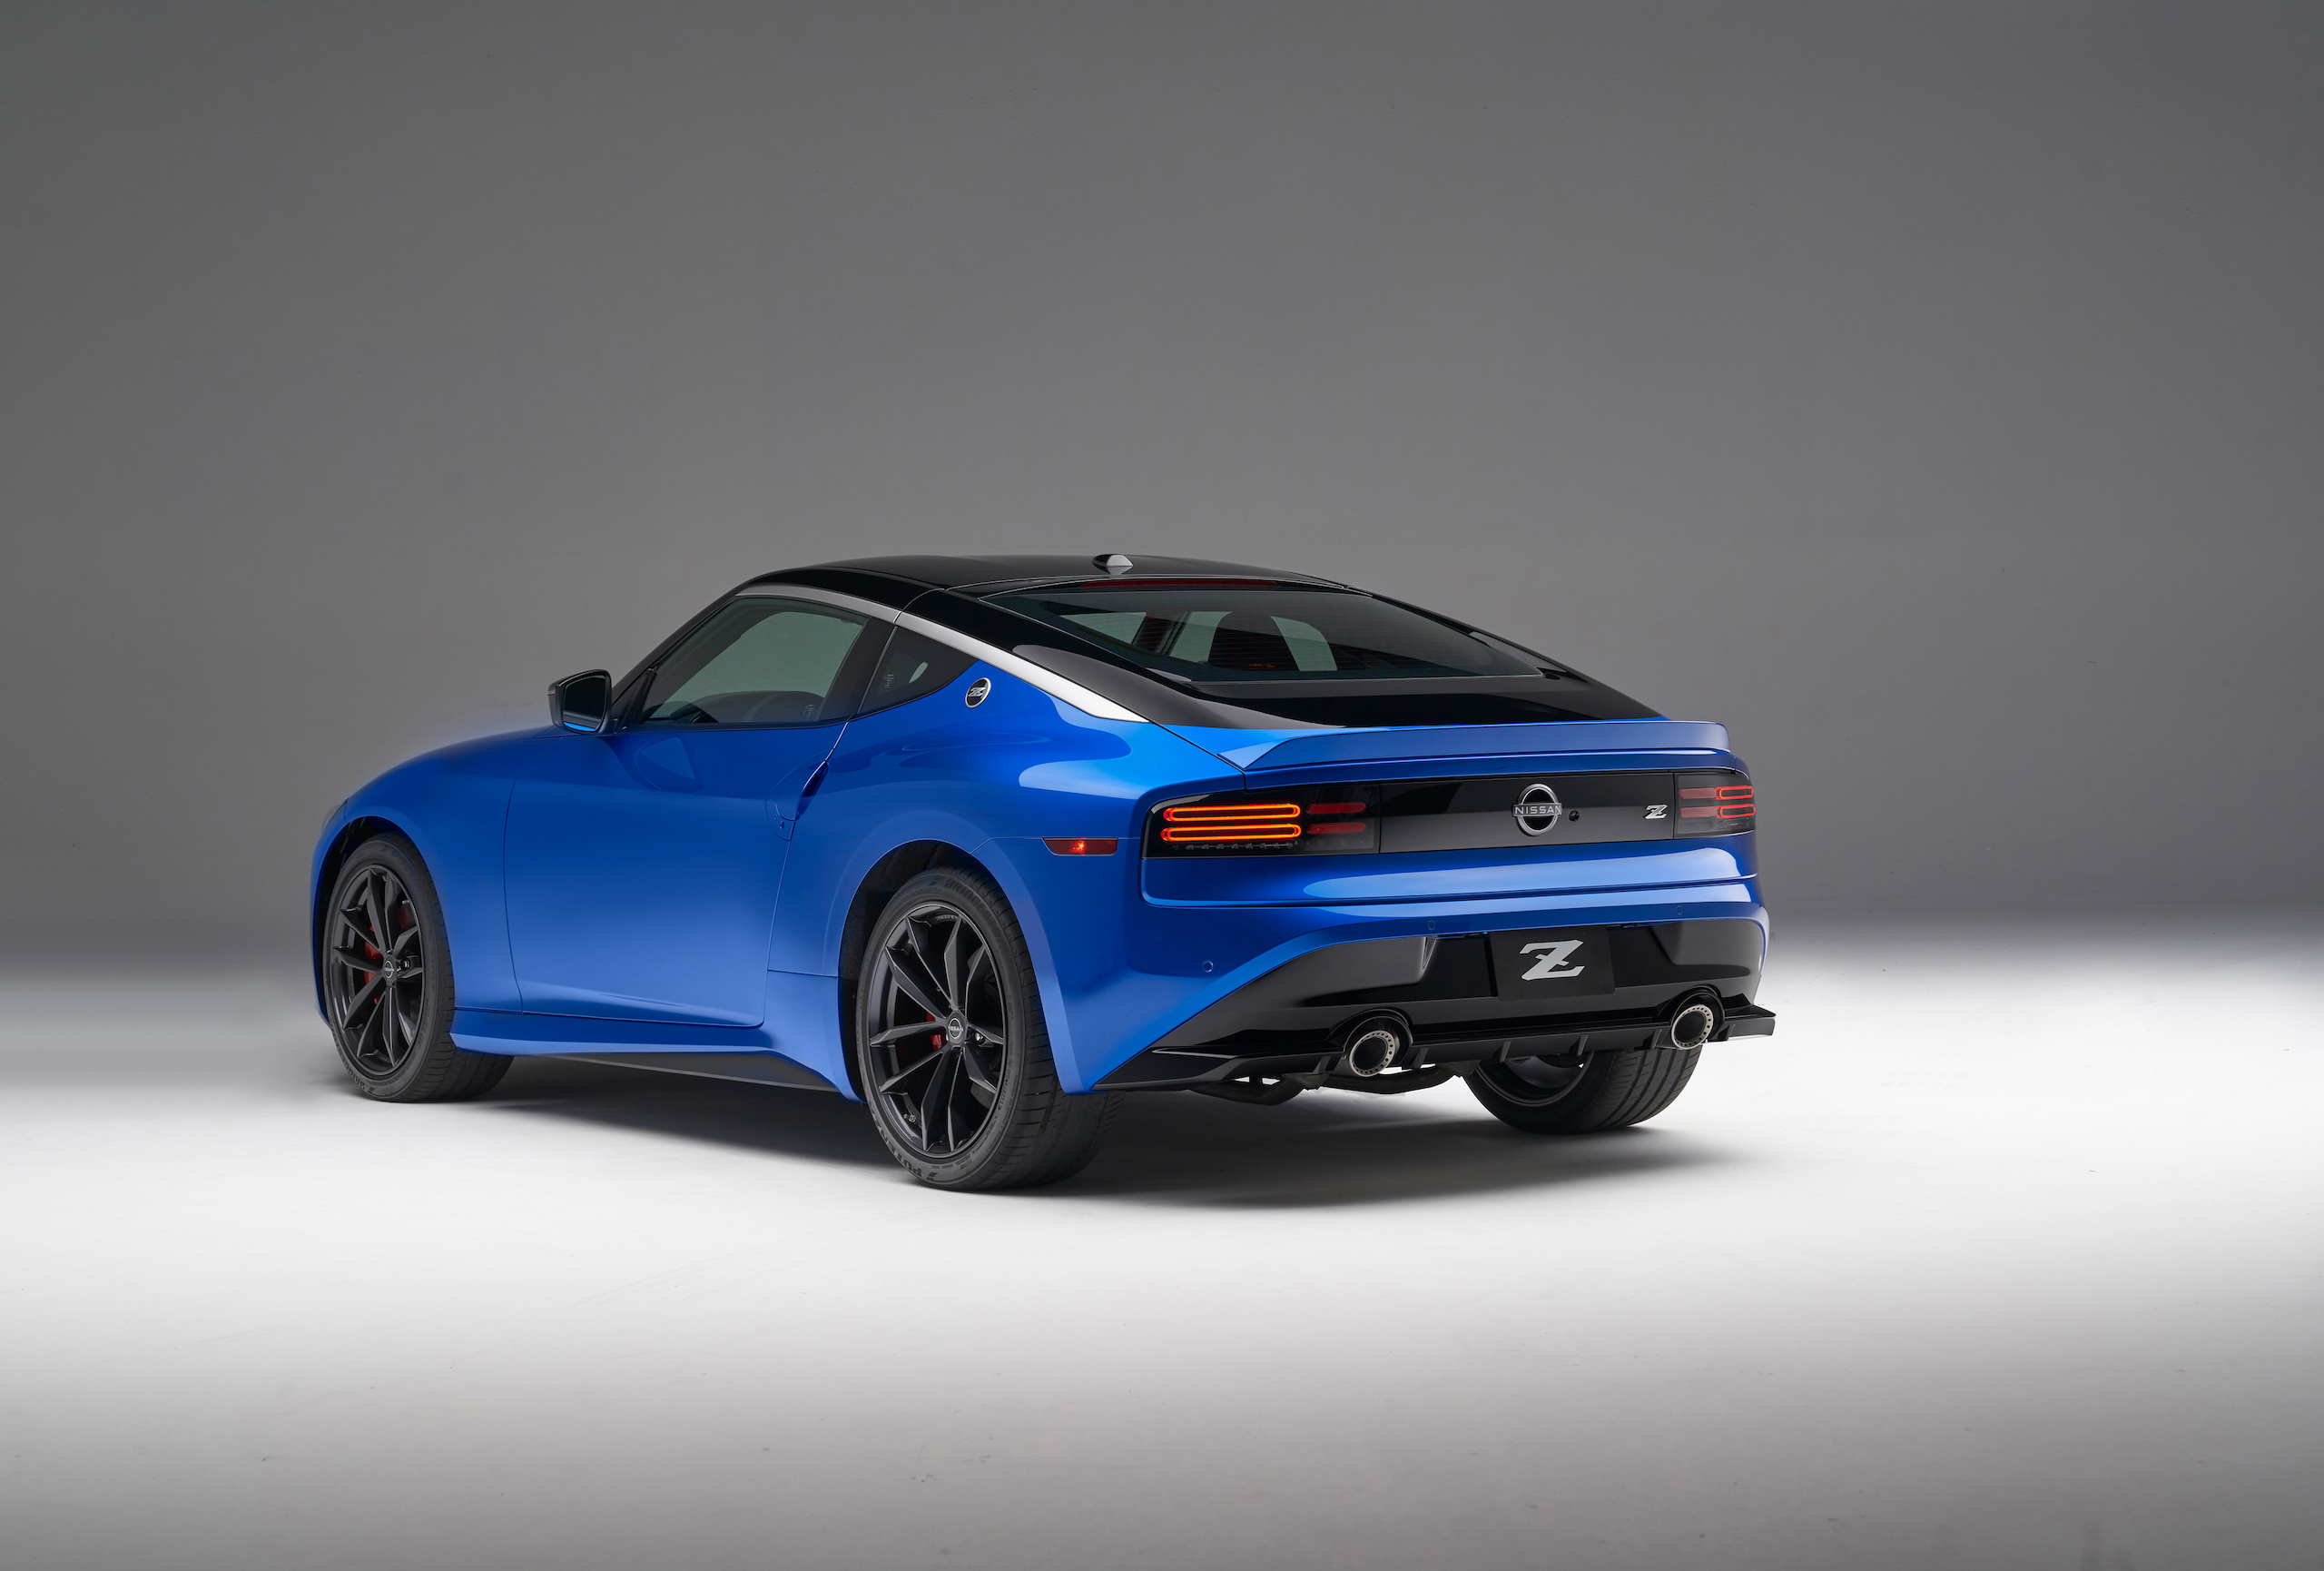 2023 Nissan Z rear three-quarter blue